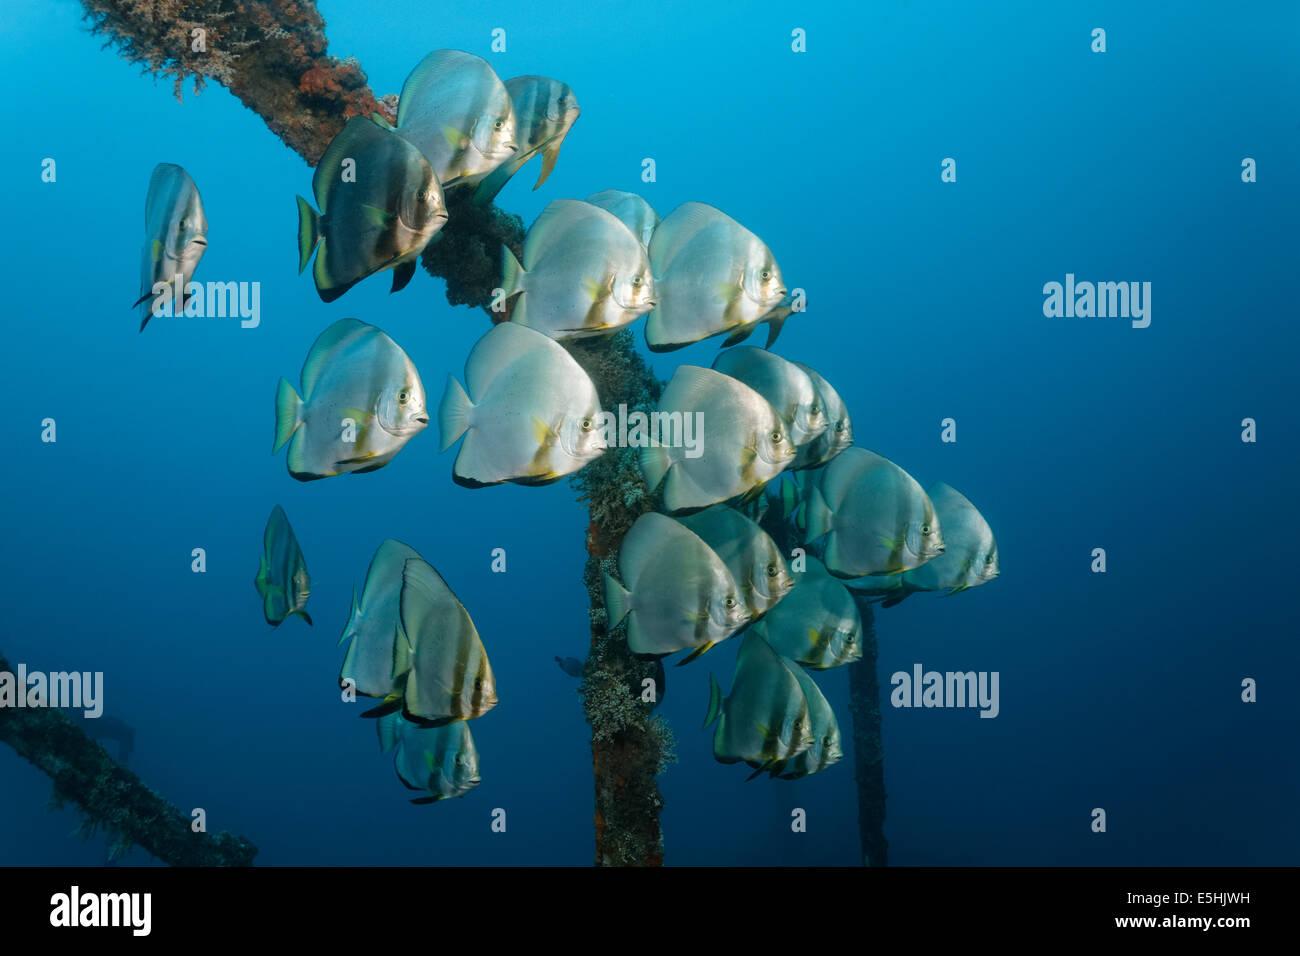 School of teira batfish (Platax teira) above the Alma Jane wreck, Sabang Beach, Puerto Galera, Mindoro, Philippines - Stock Image